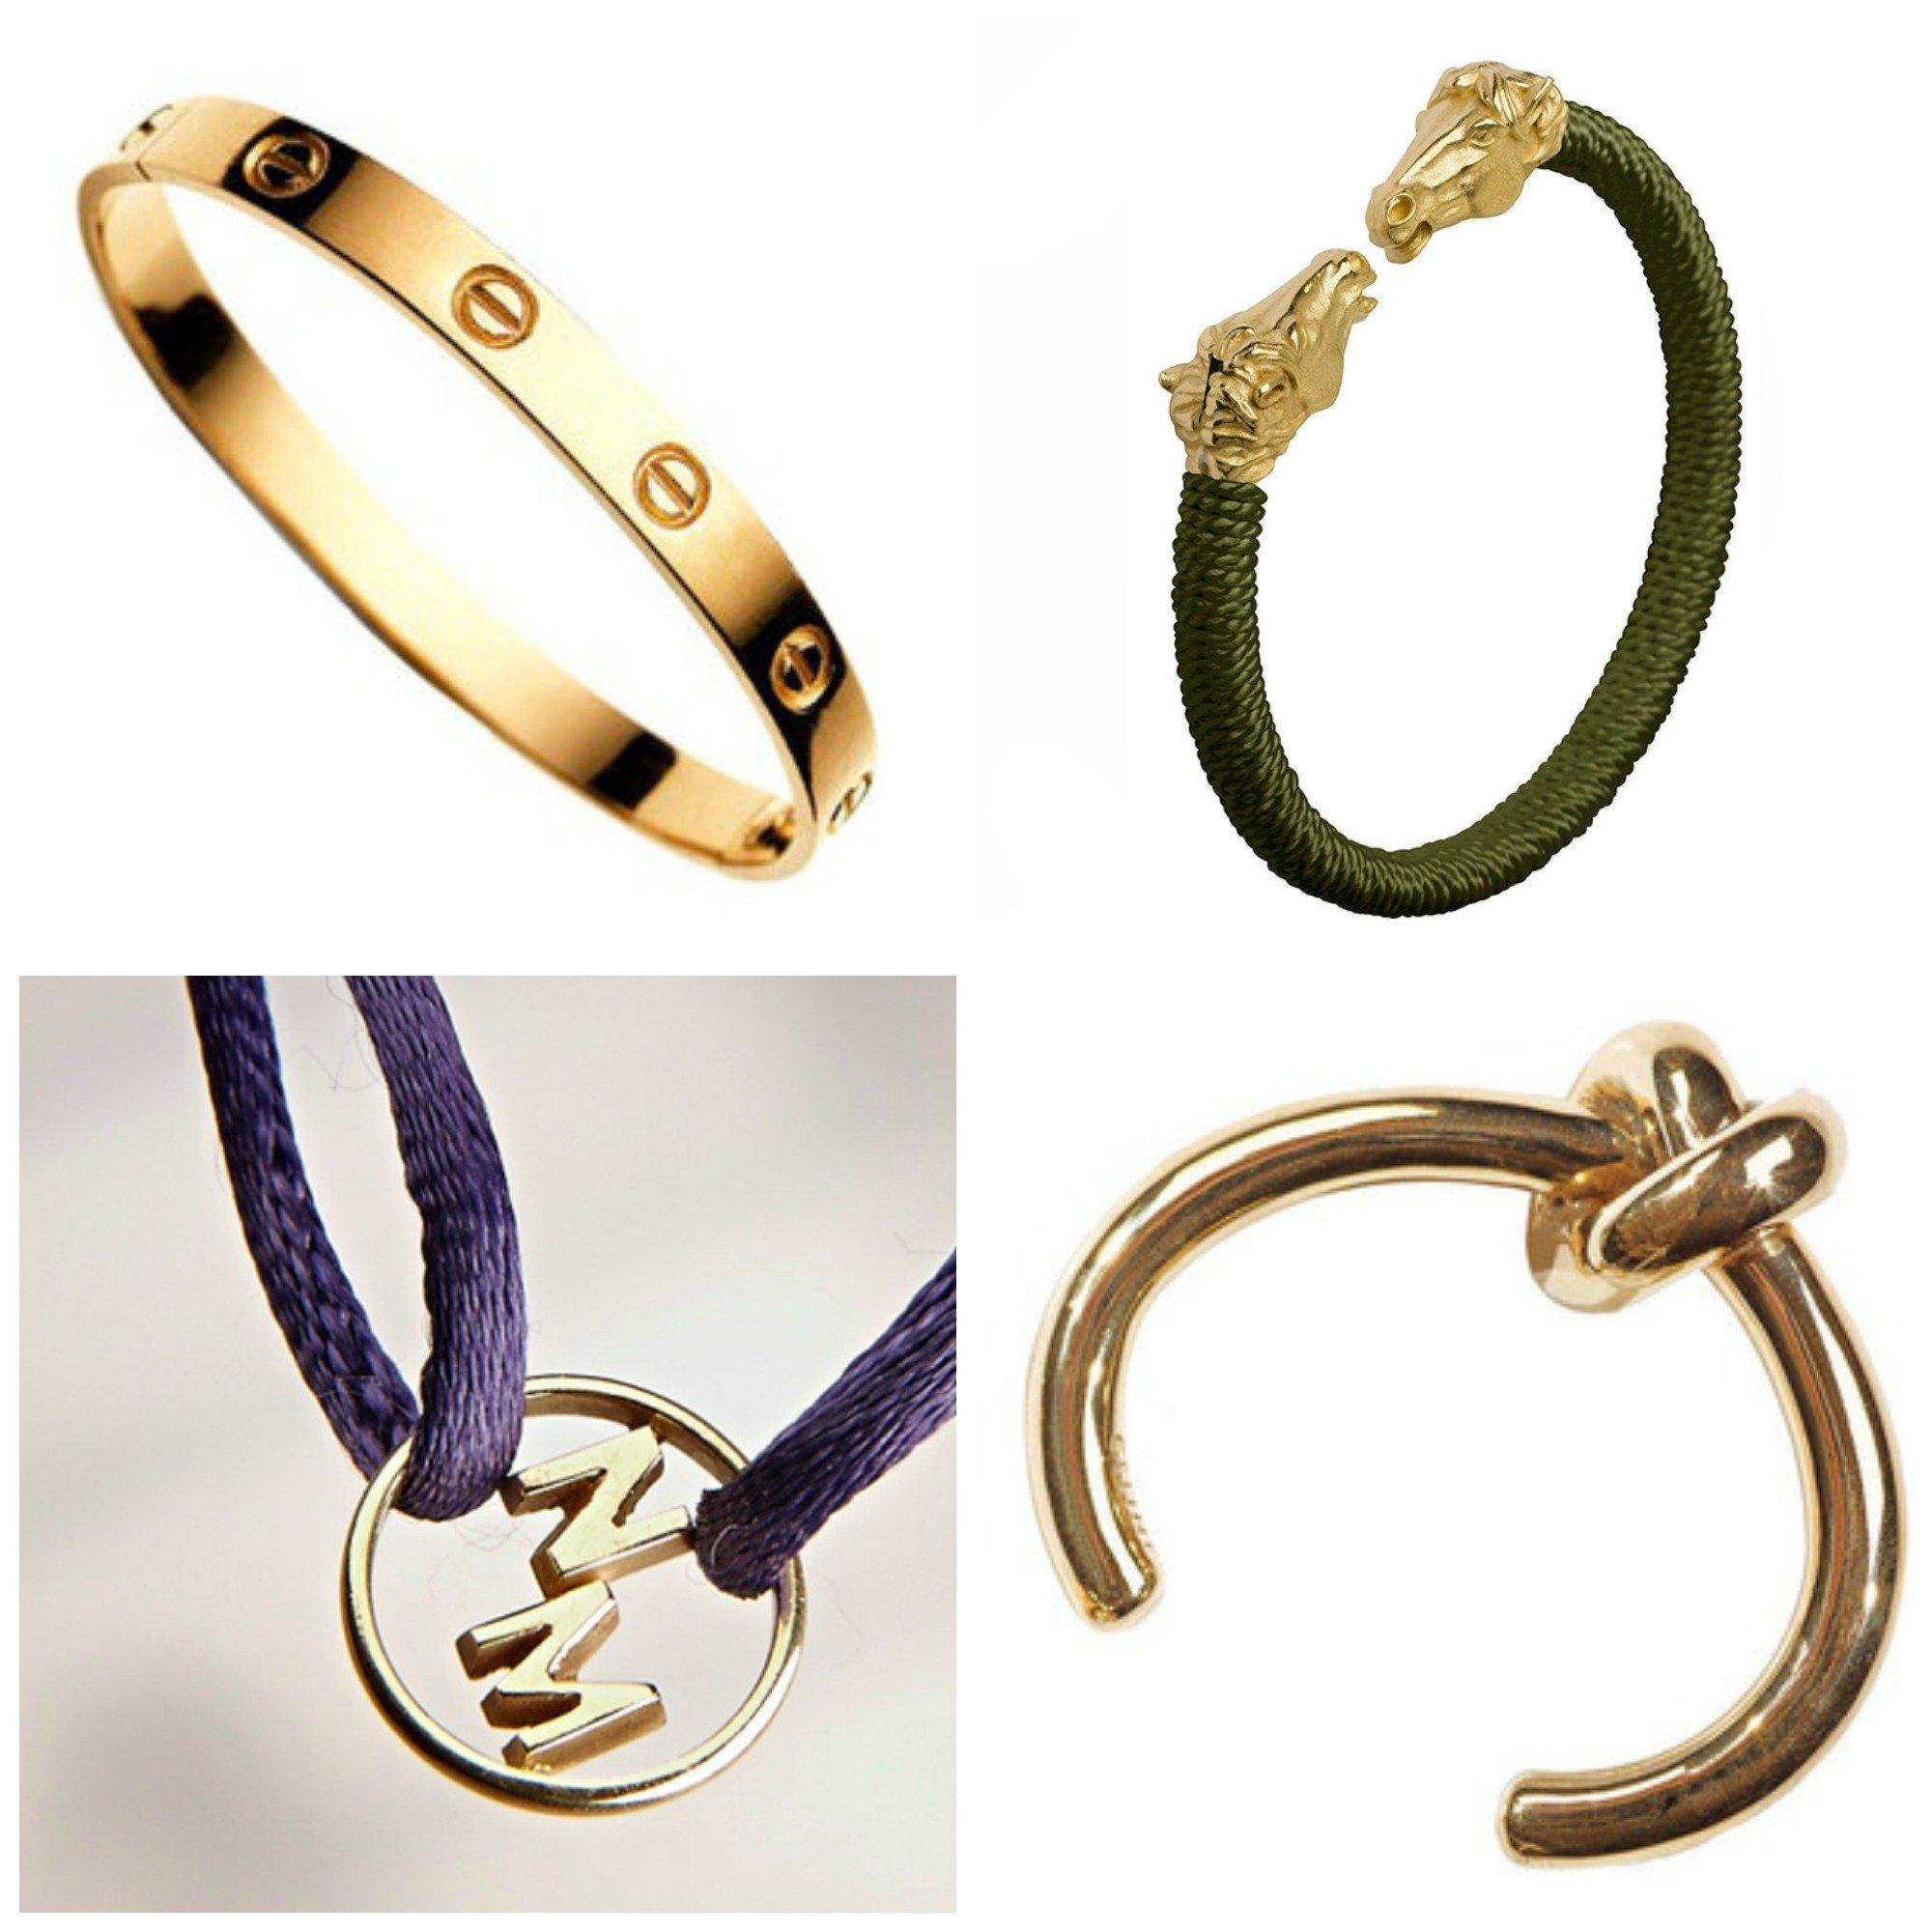 Voorkeur Cartier love bracelet, Zodiac, Minitials, Celine knot bracelet  JA33